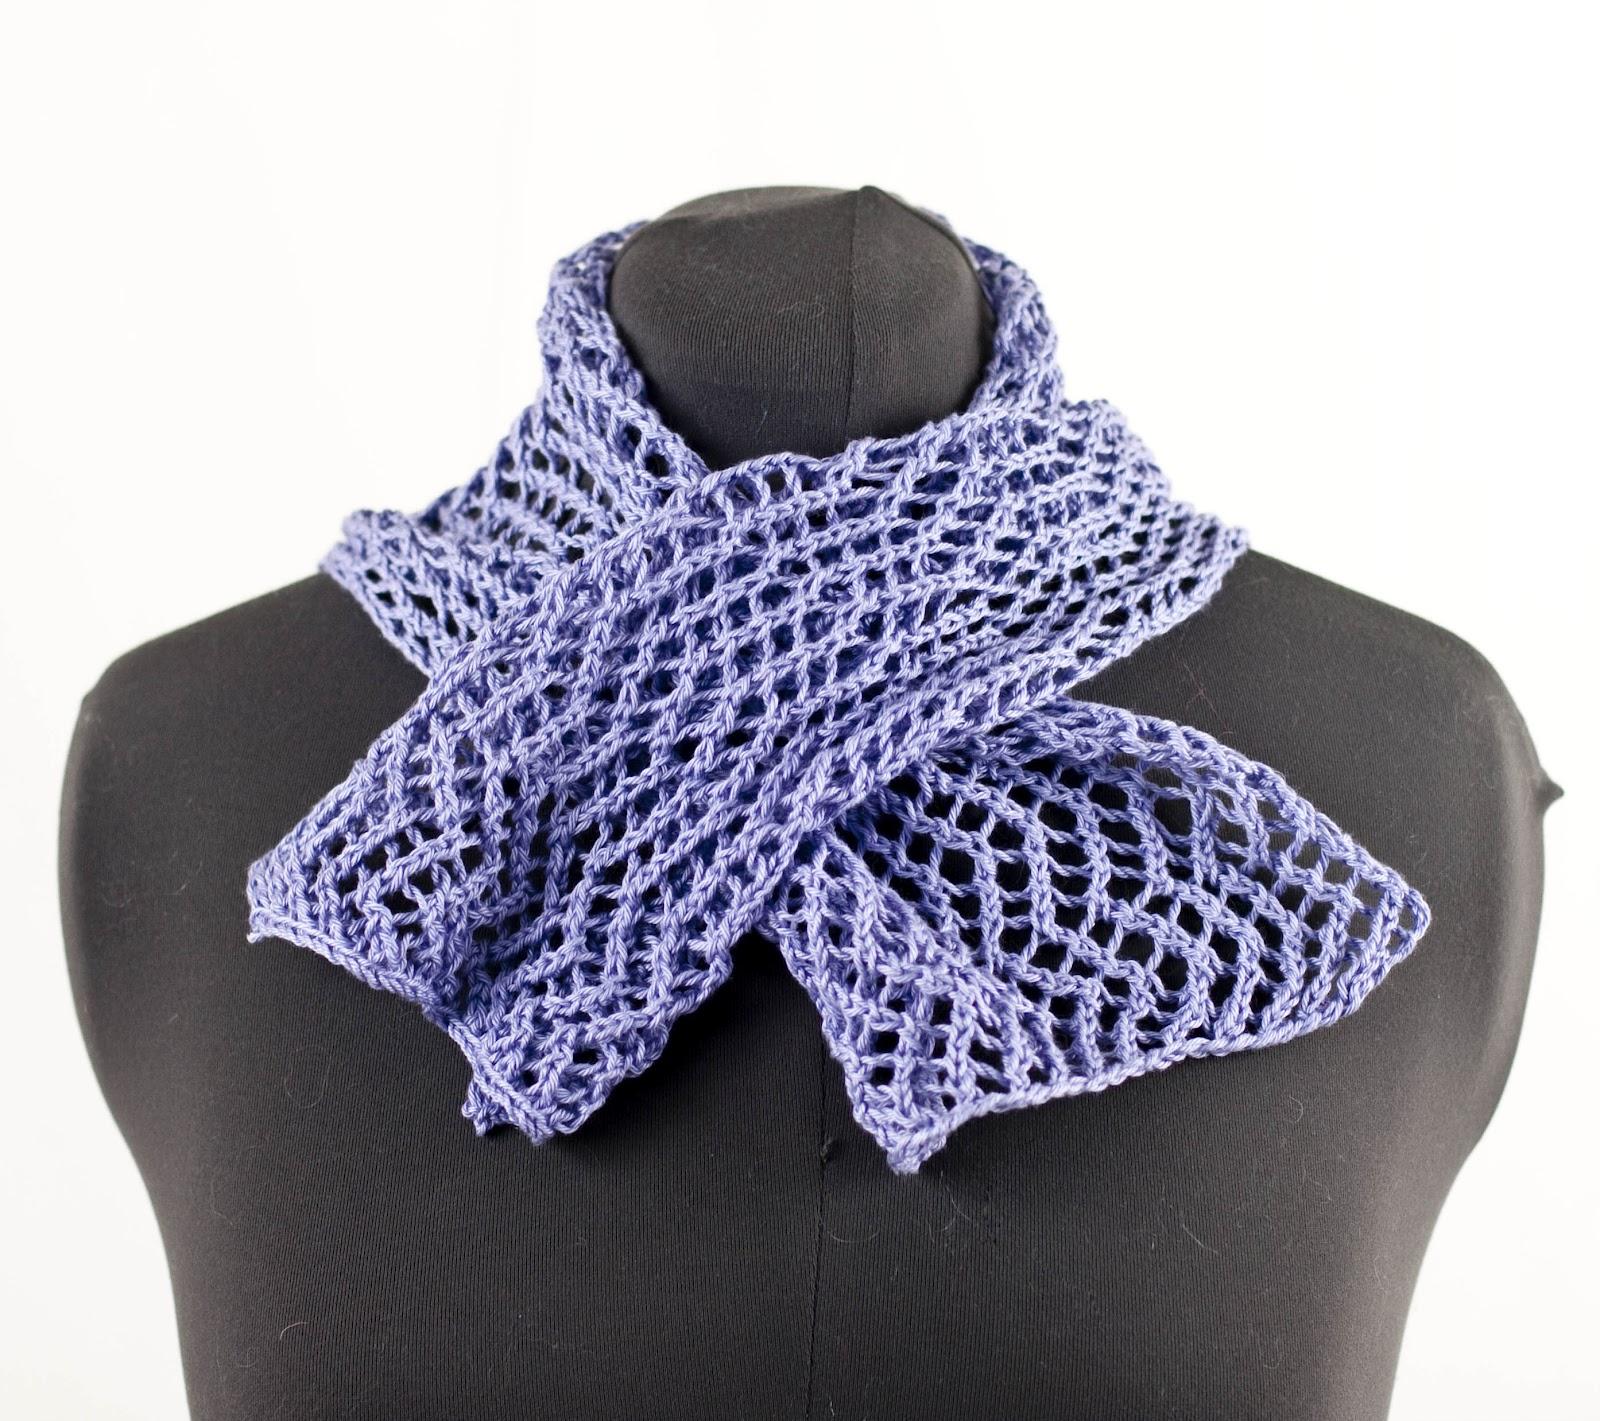 Lace Zig Zag Scarf Knitting Pattern : Cascade yarns ultra pima fine zigzag lace scarf wrap